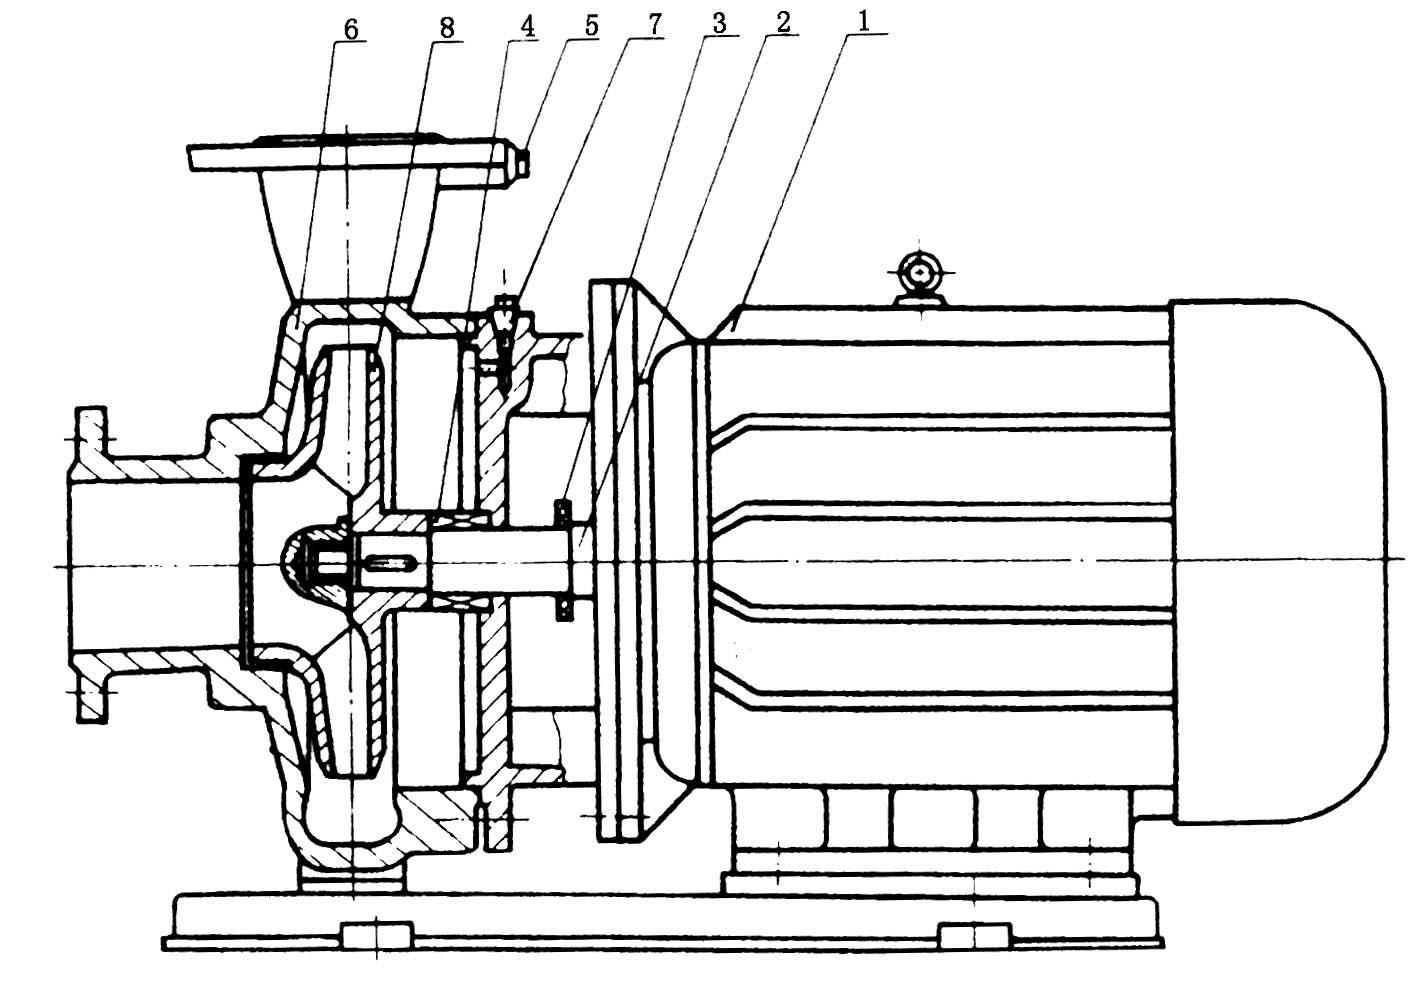 isw型卧式管道离心泵结构图